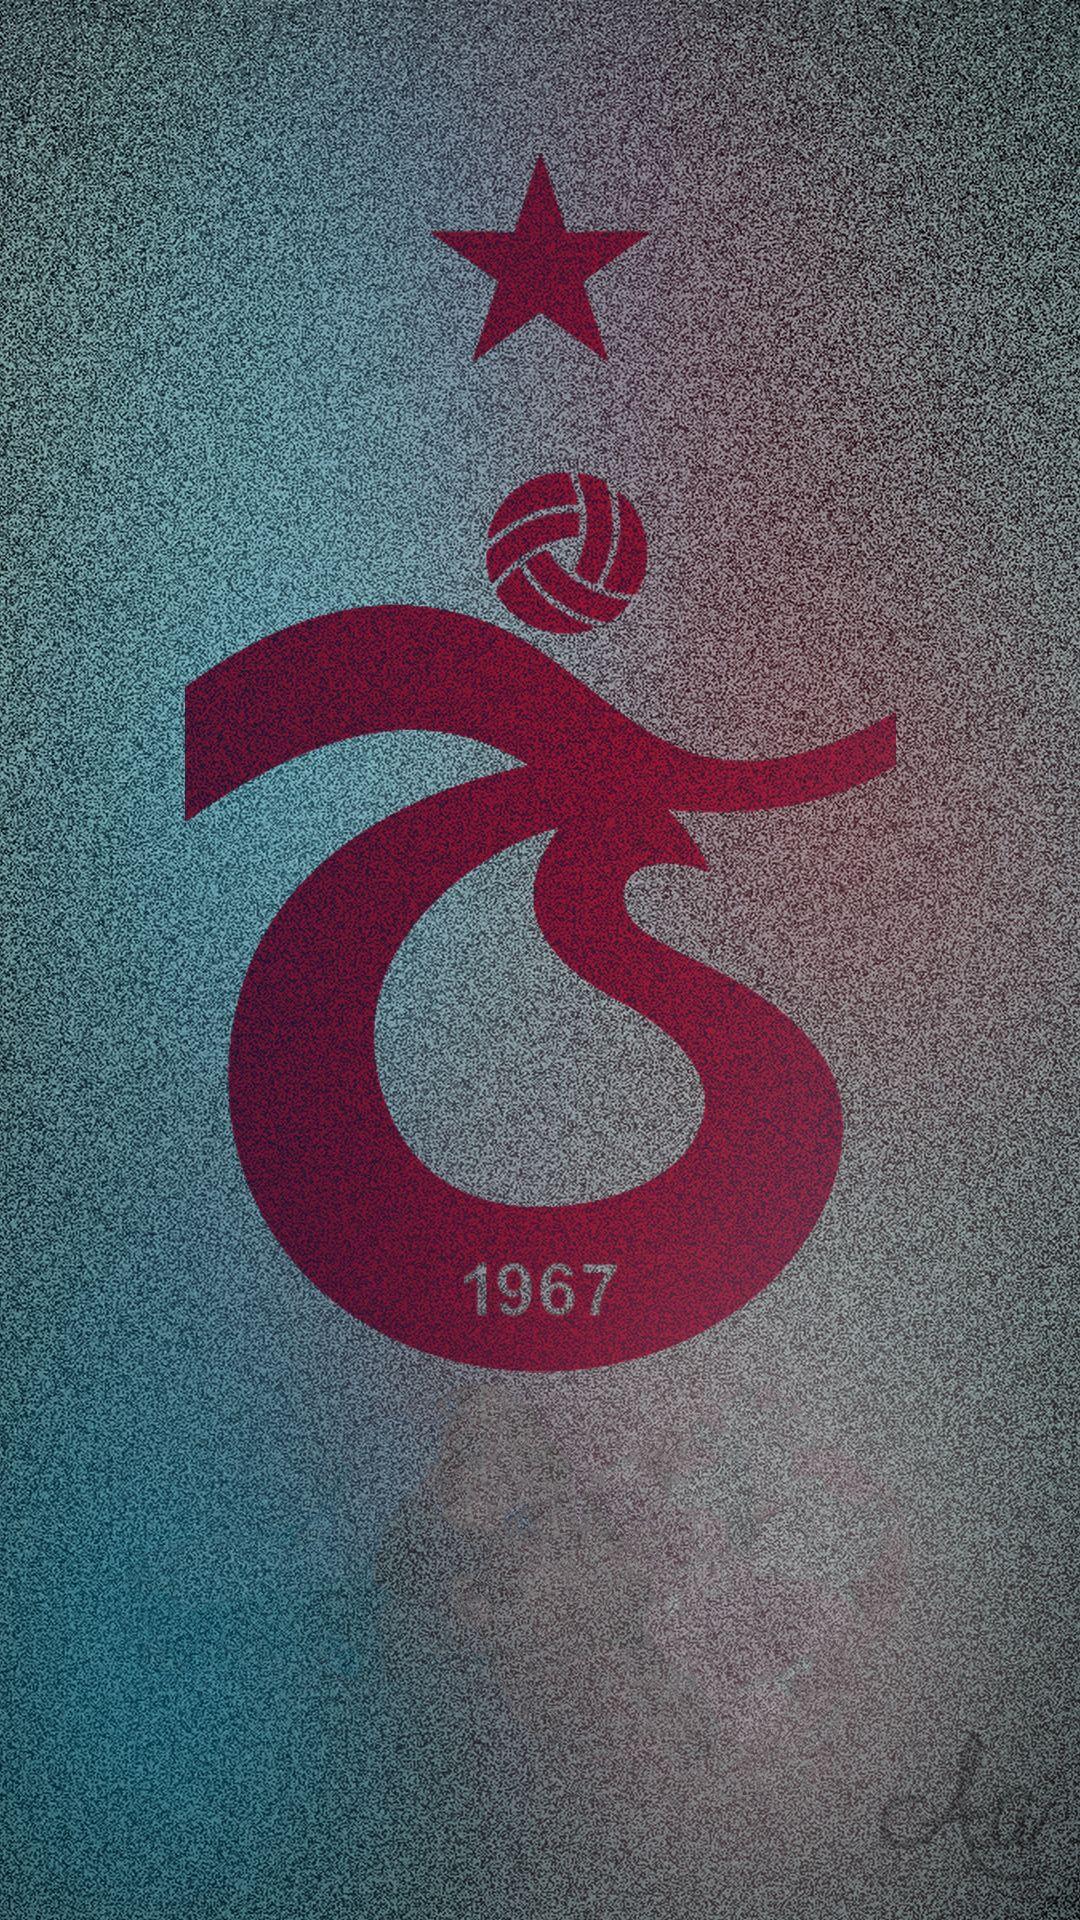 Trabzonspor Trabzonspor 61 BizeHerYerTrabzon in 2020